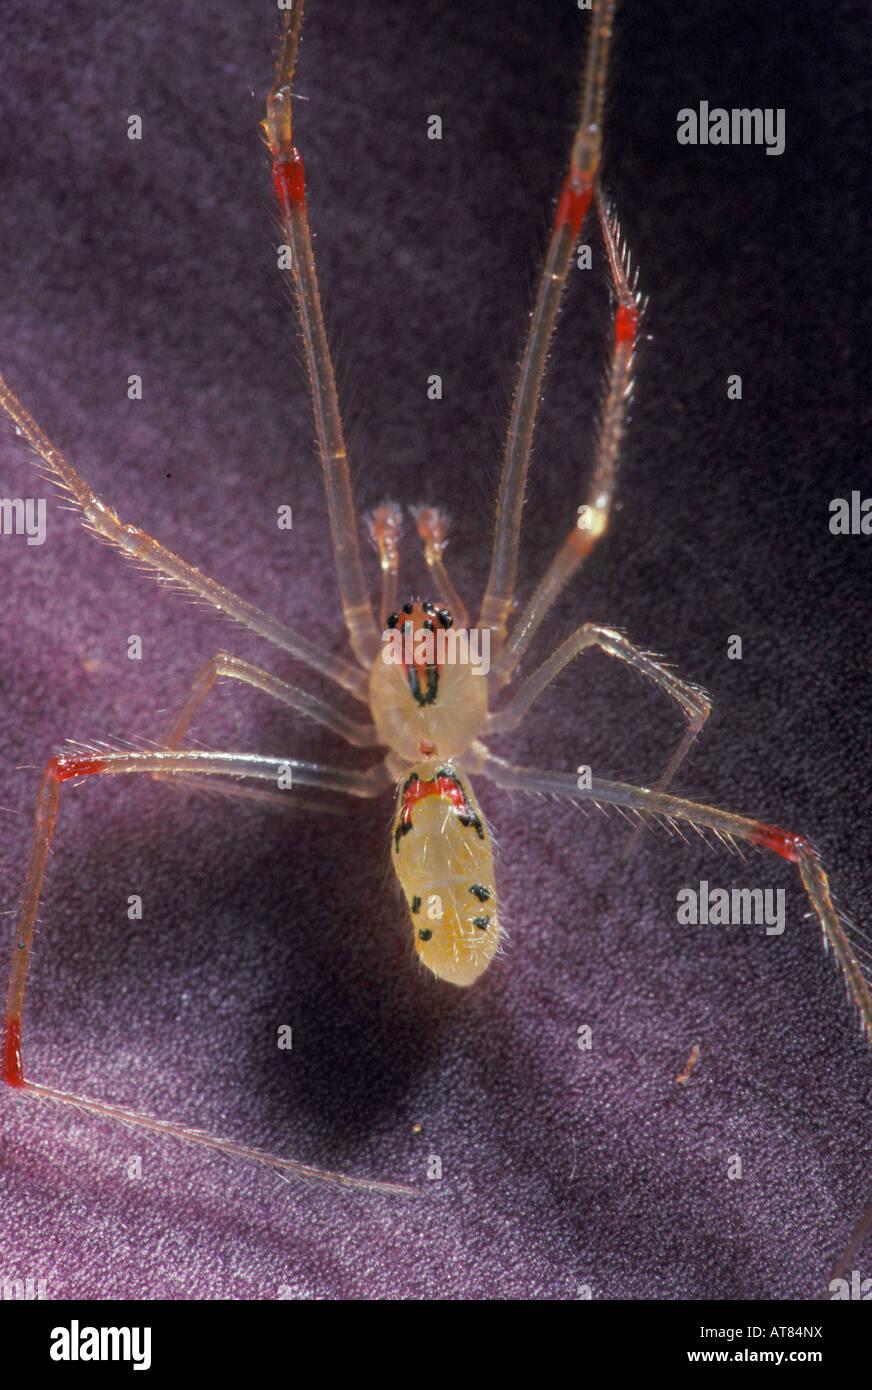 The Hawaiian happyface spider, (theridion grallator). Taken near the volcanoes NP Hawaii. - Stock Image